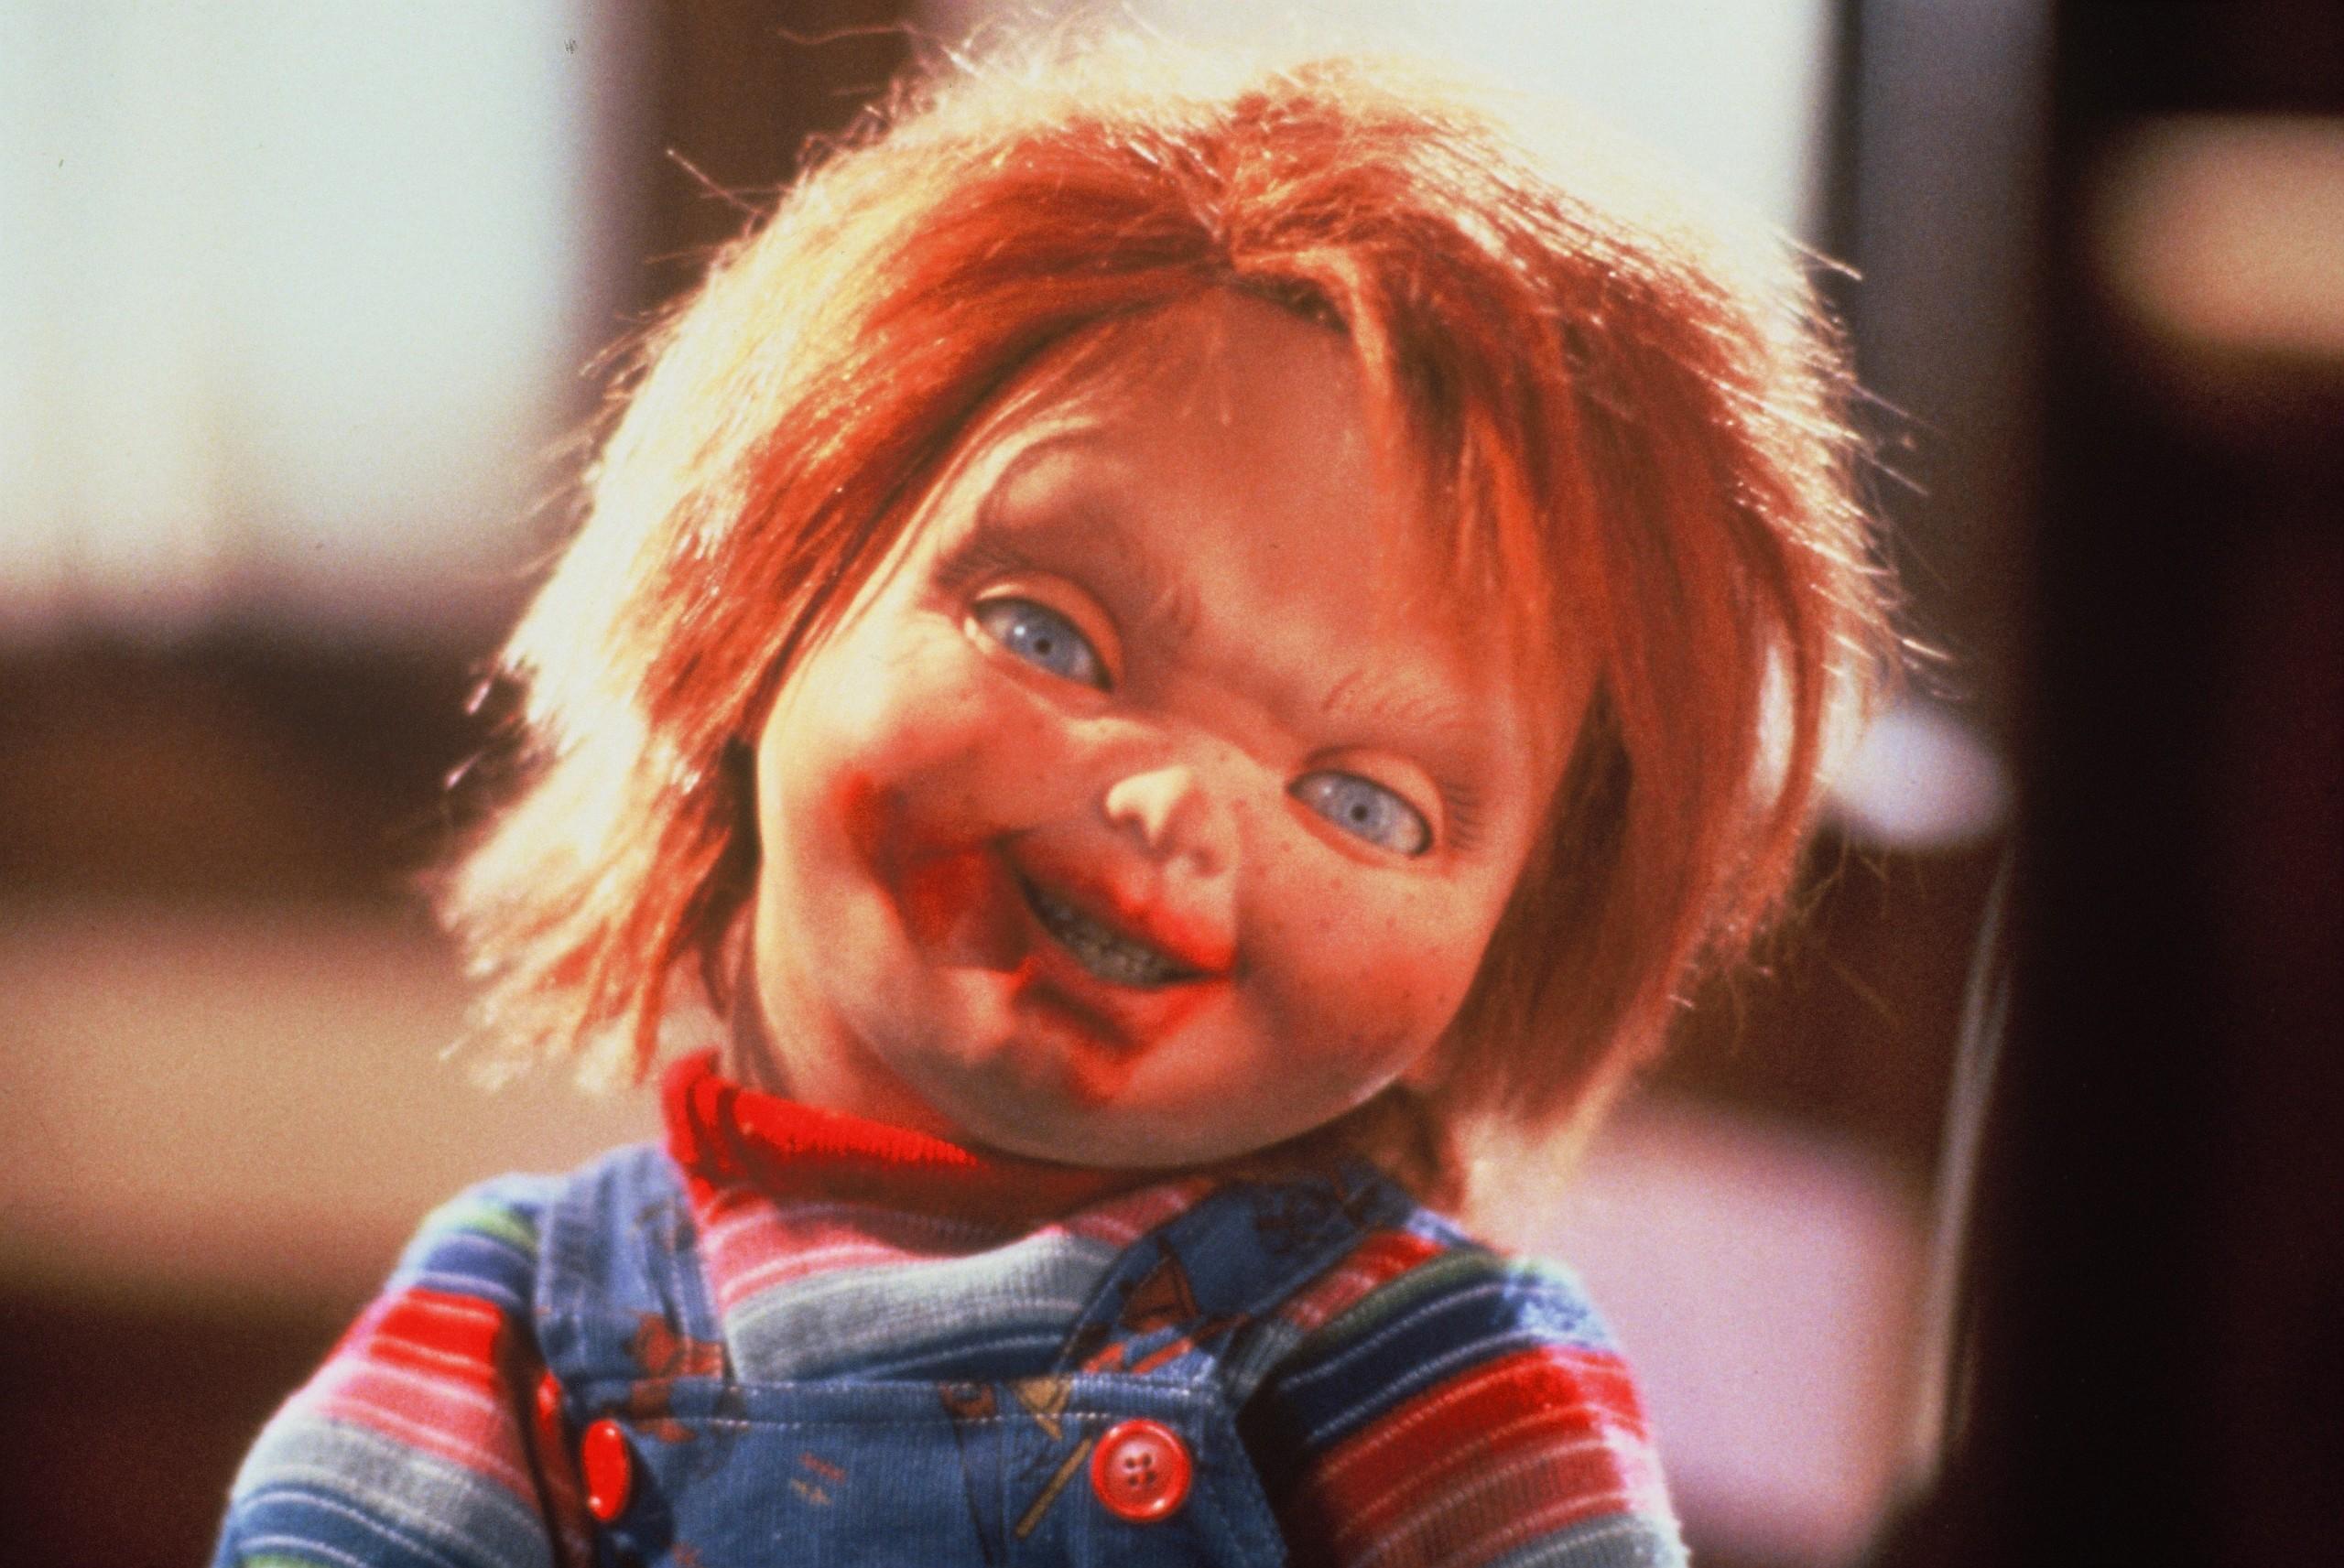 CHUCKY IS BACK!  Watch the 'Cult of Chucky' teaser!